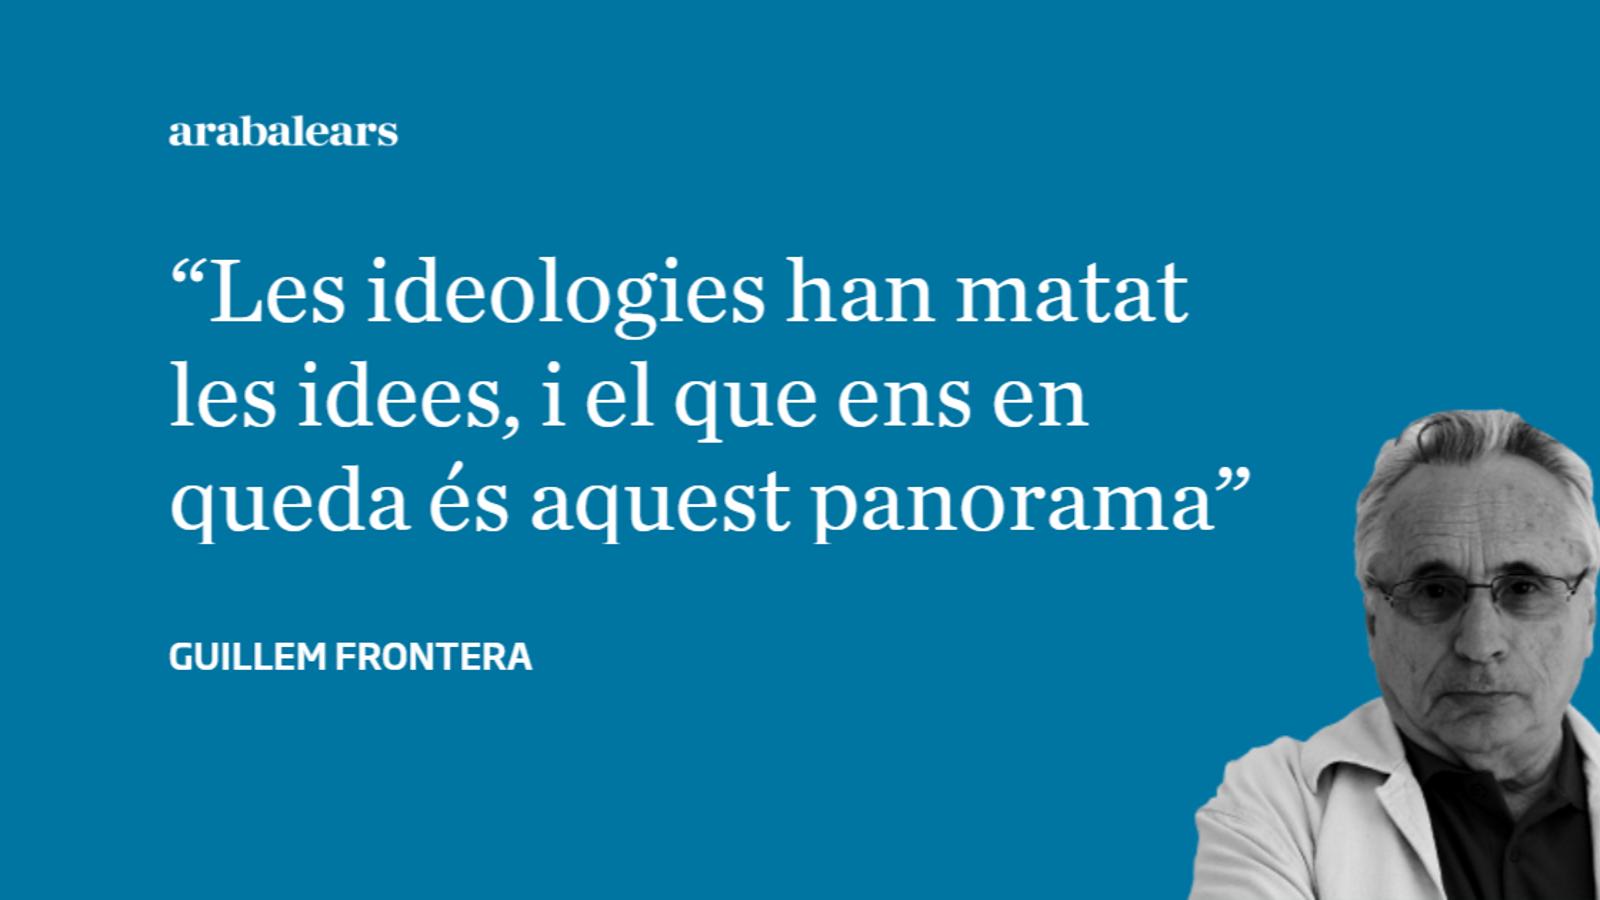 'Charanga y pandereta'